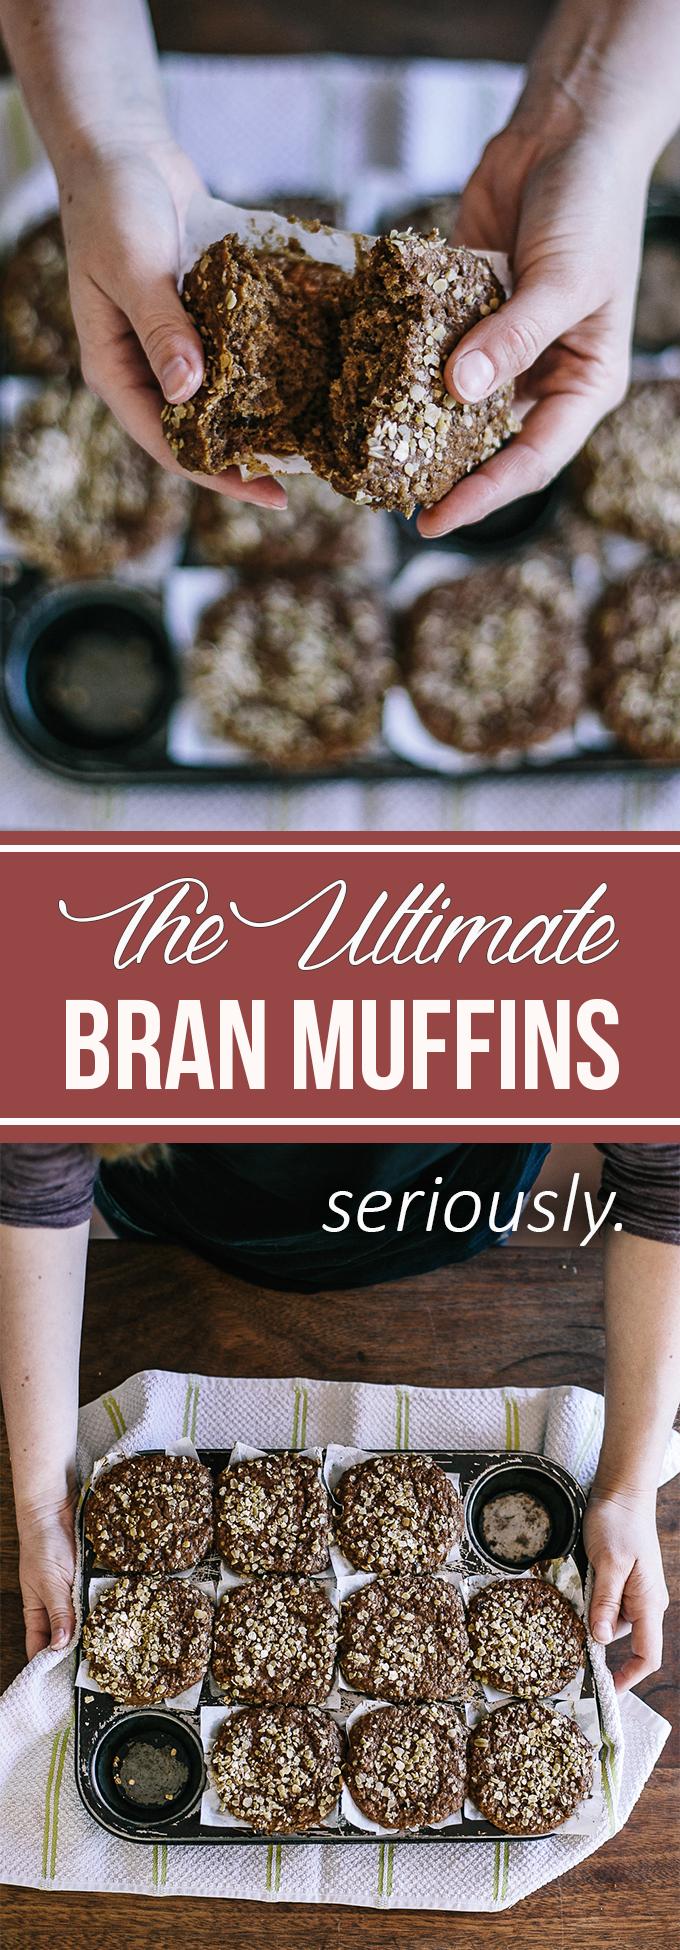 Bran muffin recipe   Bran muffins with molasses   Bran muffins healthy